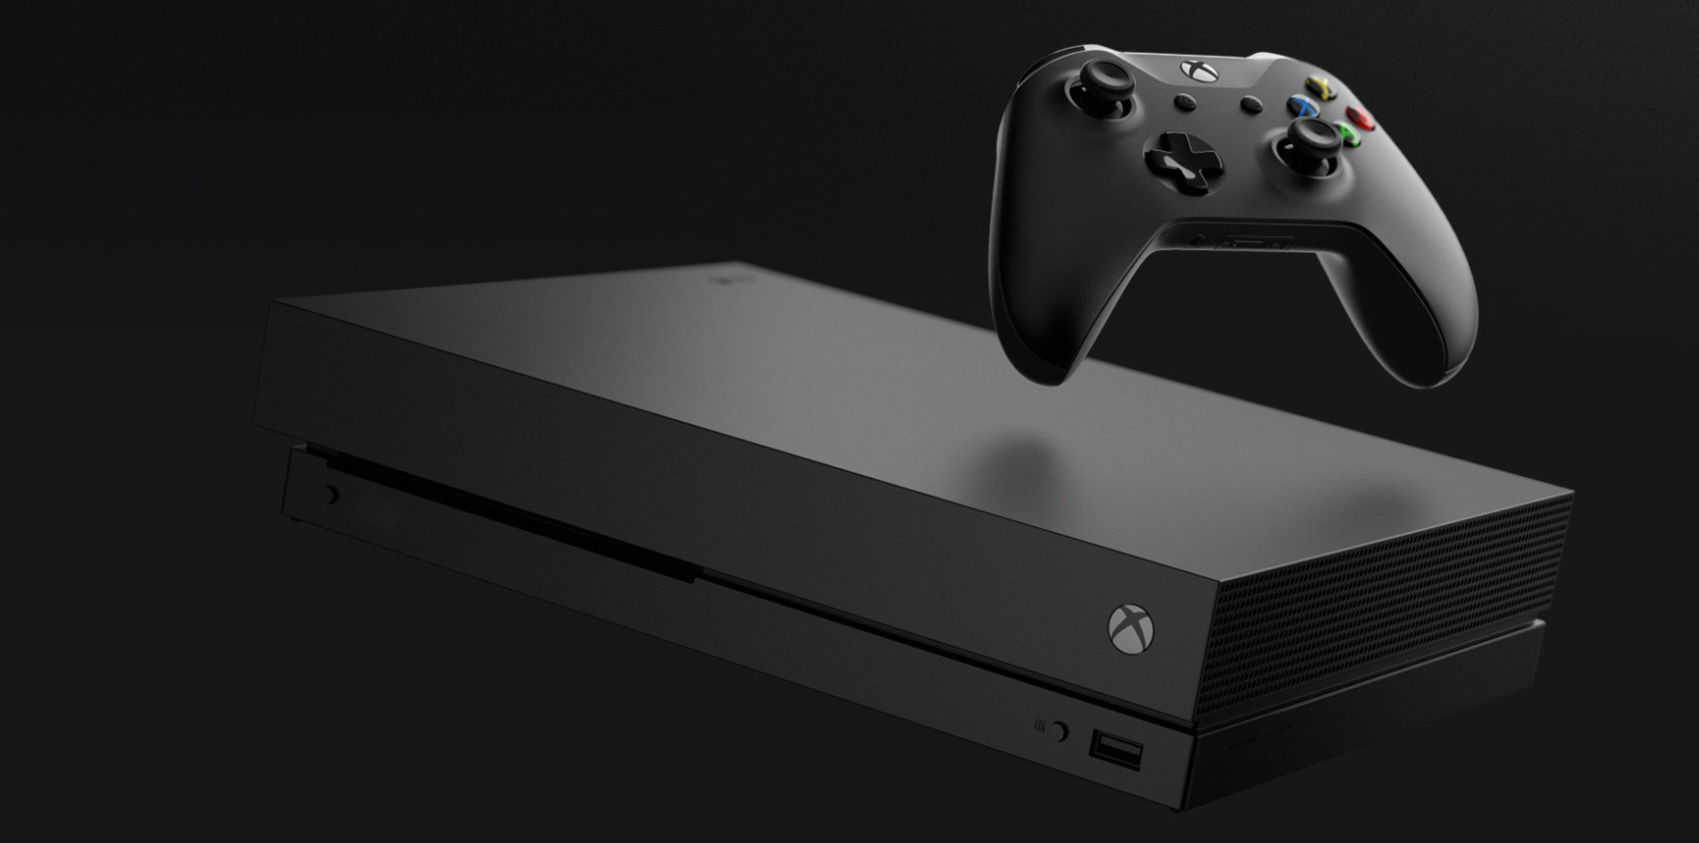 Should I Get An Xbox One X If Dont Have A 4k Tv Or Find Inner Image 360 Slim Motherboard Download Peace